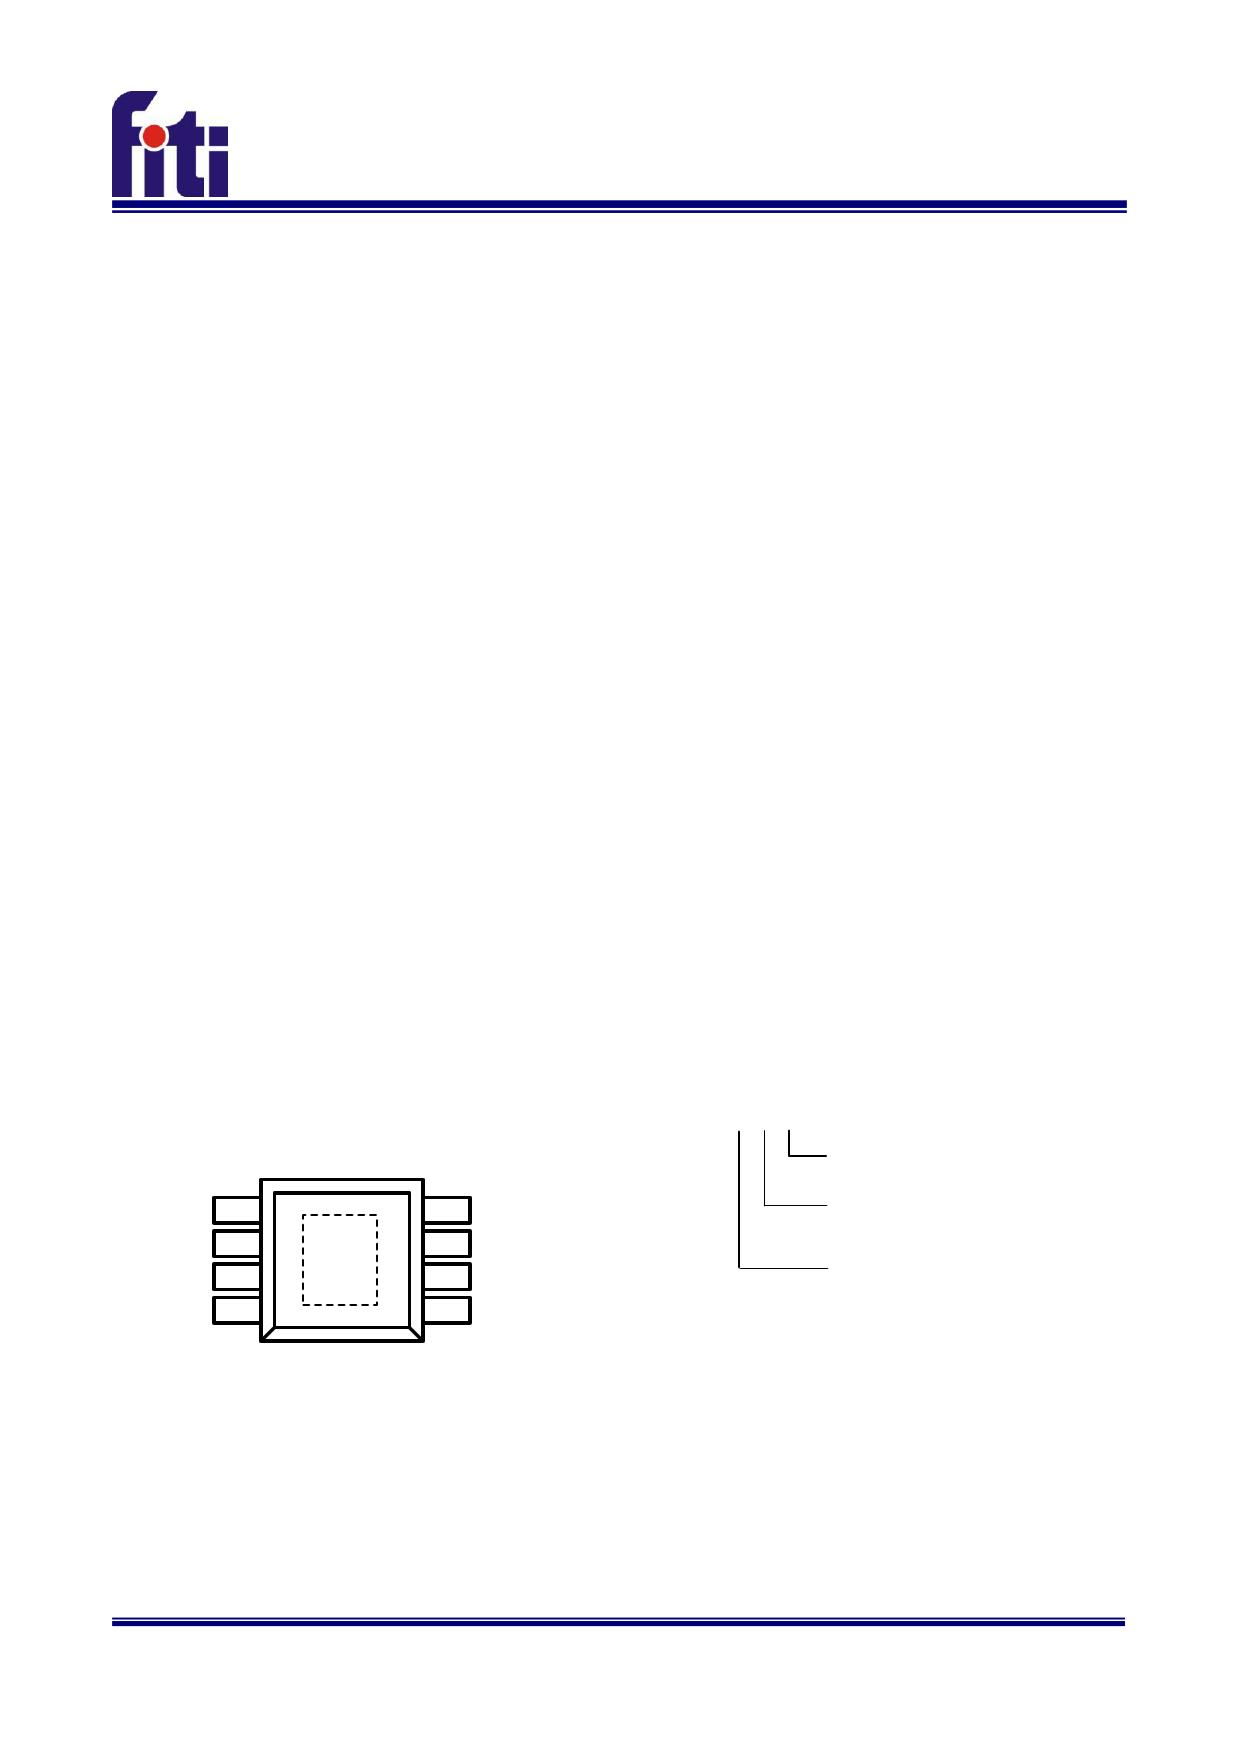 FR9806 datasheet